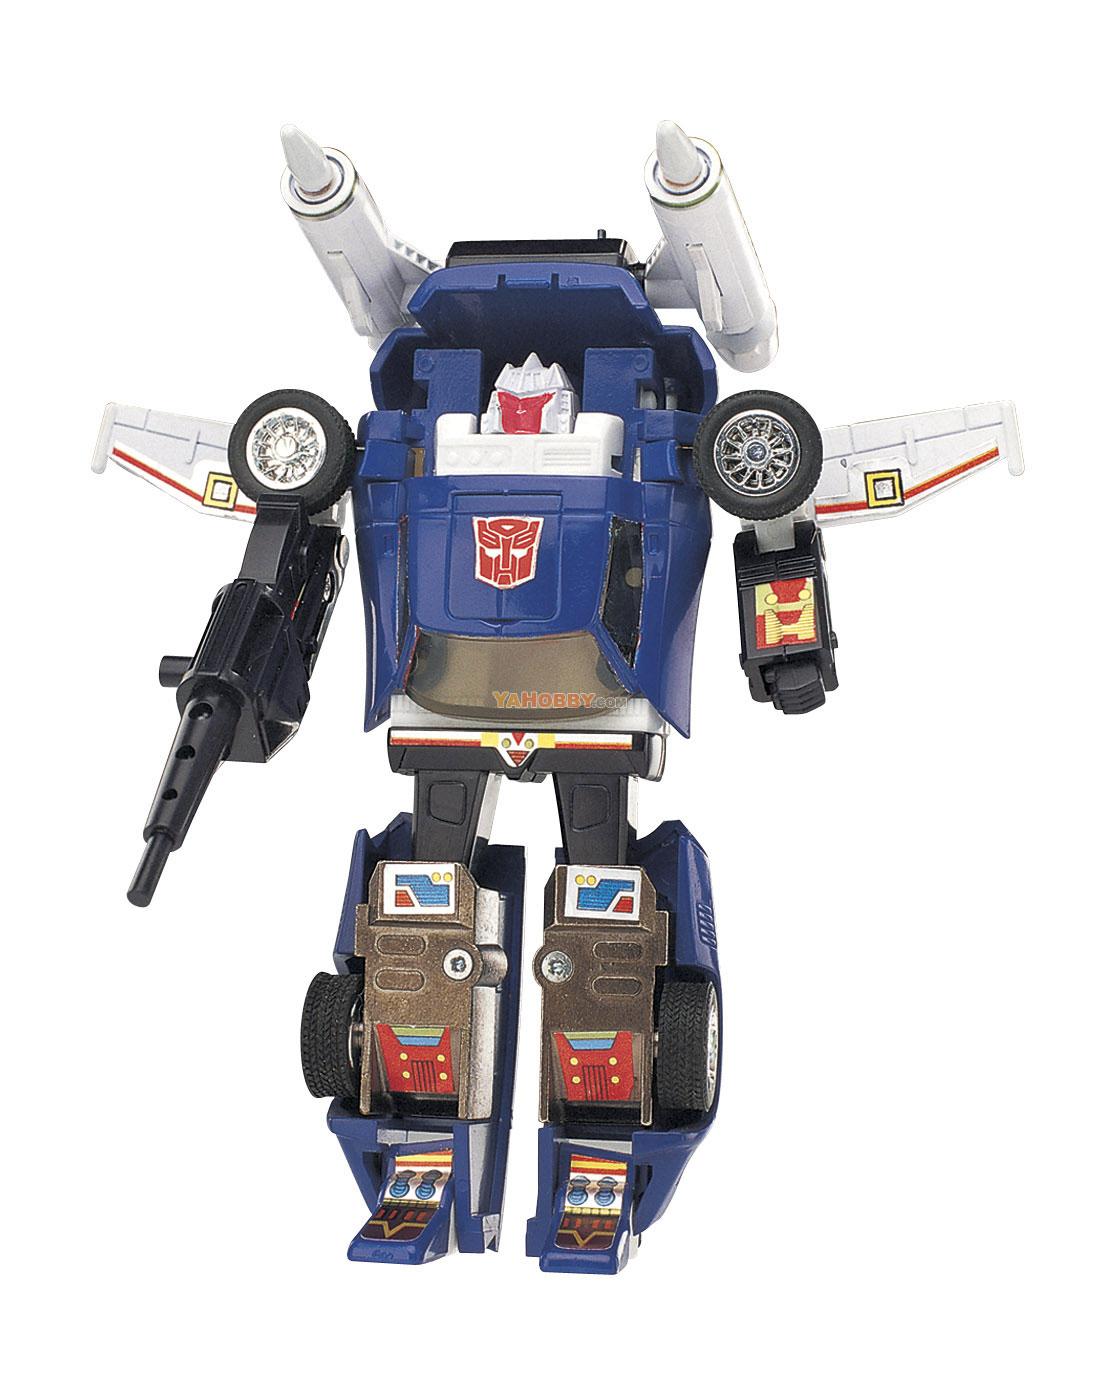 Hasbro commemorative transformers g reissue autobot tracks